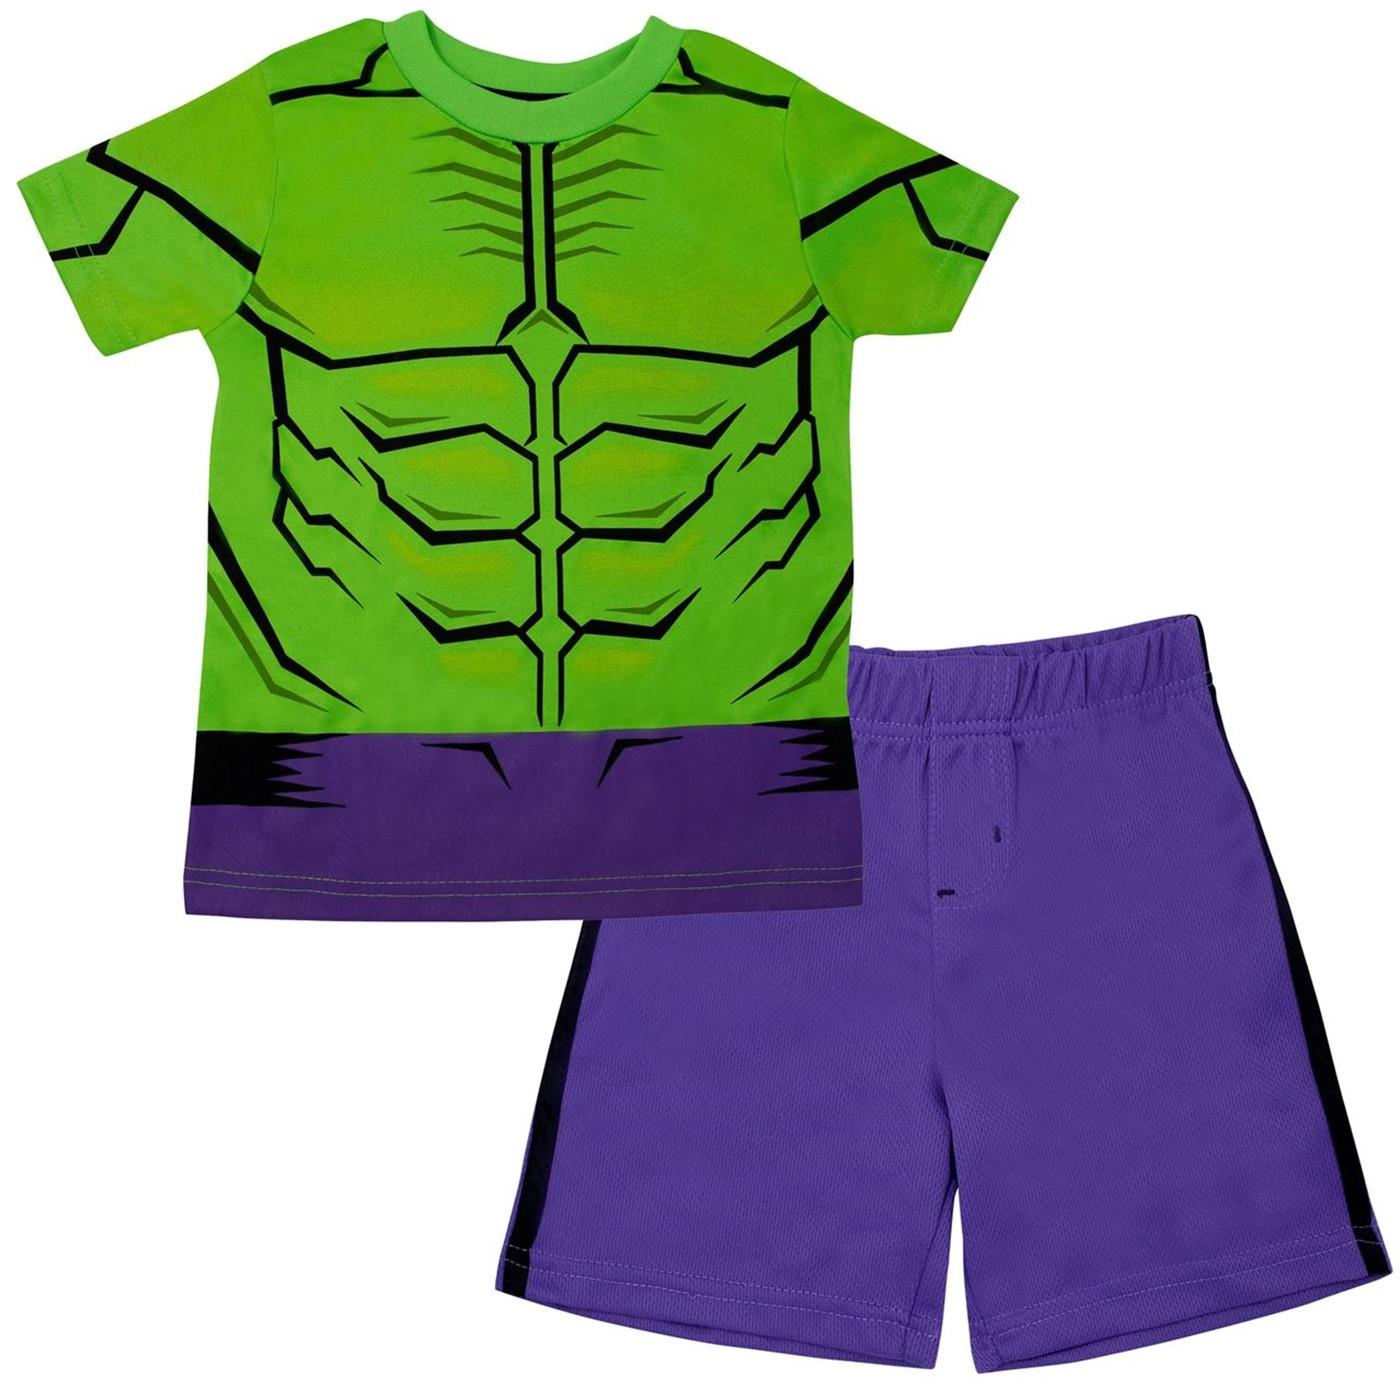 Incredible Hulk Performance Costume Kids Short Set